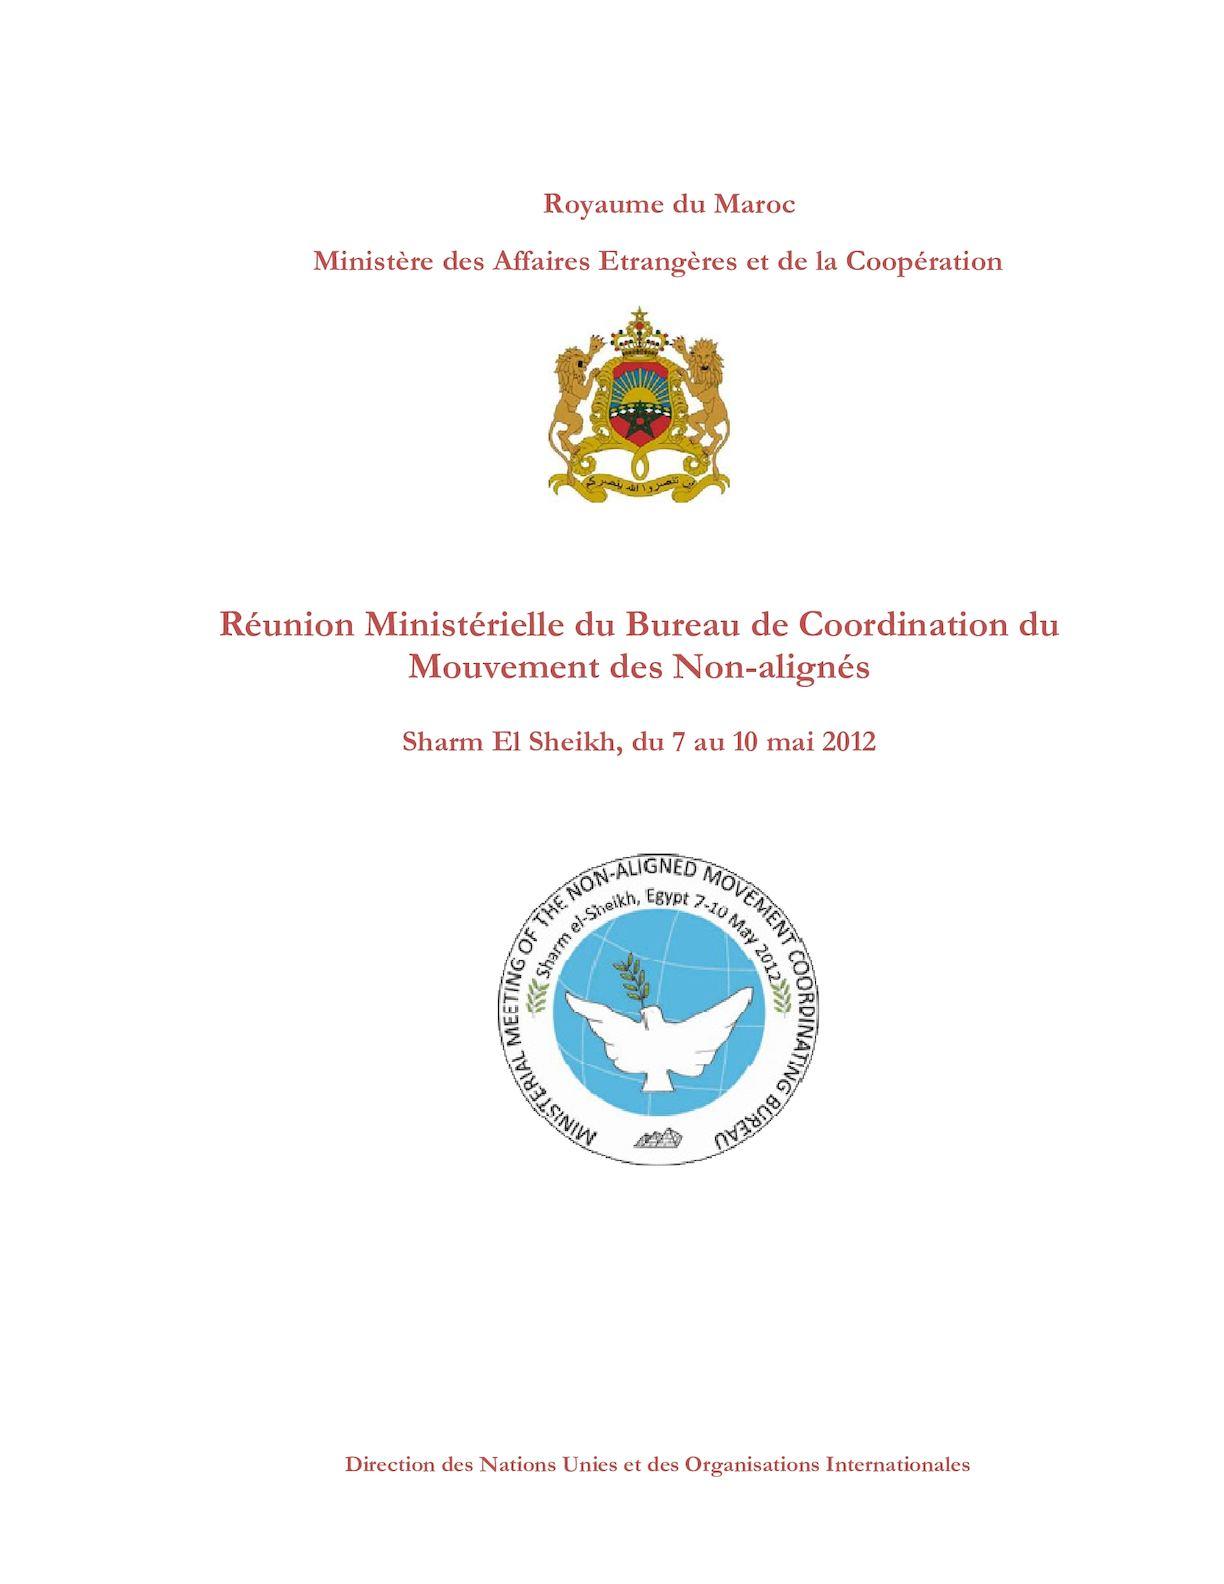 REUNION MINISTERIELLE SHARM ELSHEIKH 2012 RECUEIL EN FRANCAIS 25042012